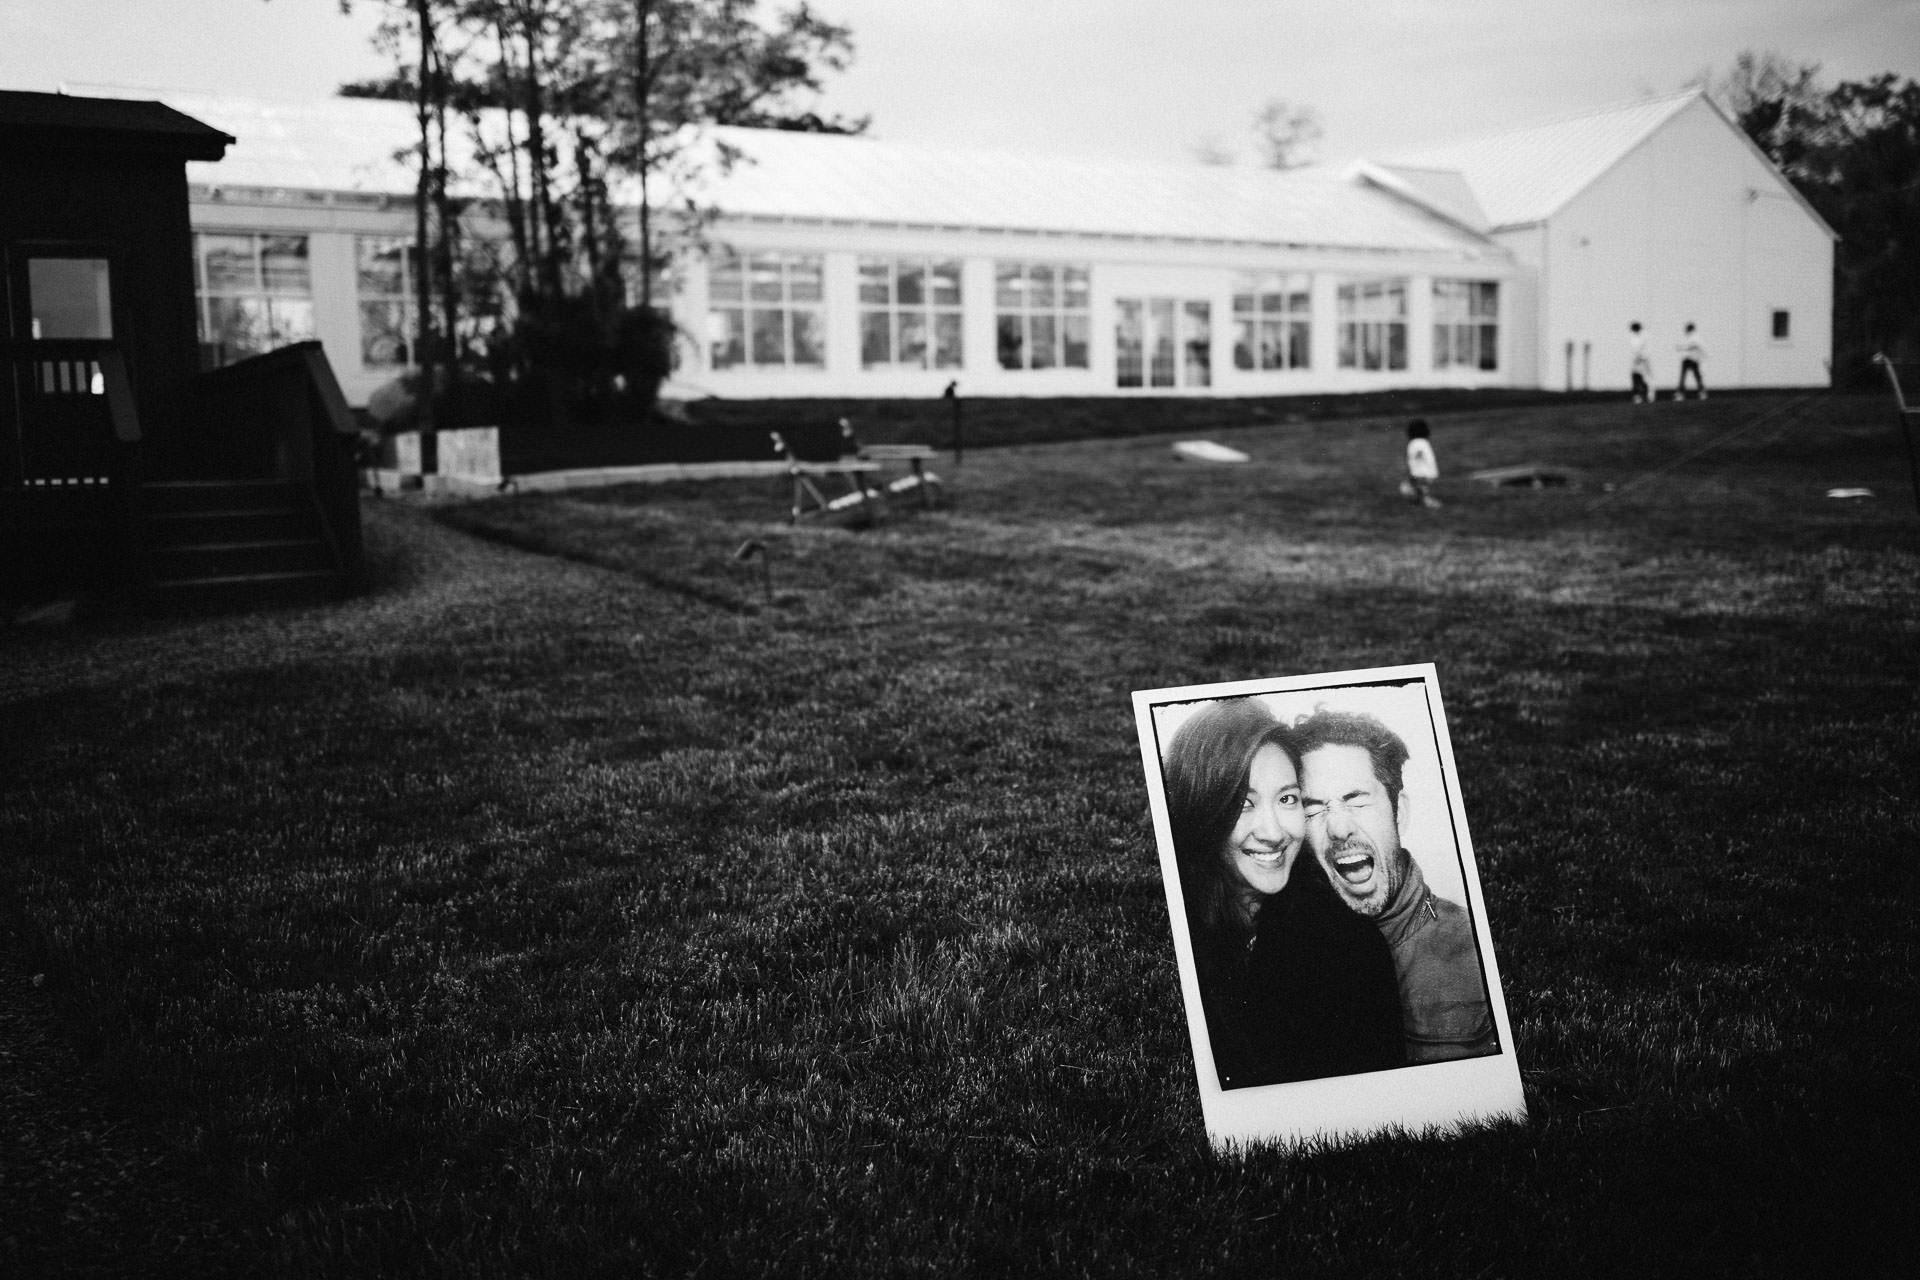 Sarah & Jonathan Wedding Audrey's Farmhouse Greenhouse Catskills, New York, by Jean-Laurent Gaudy